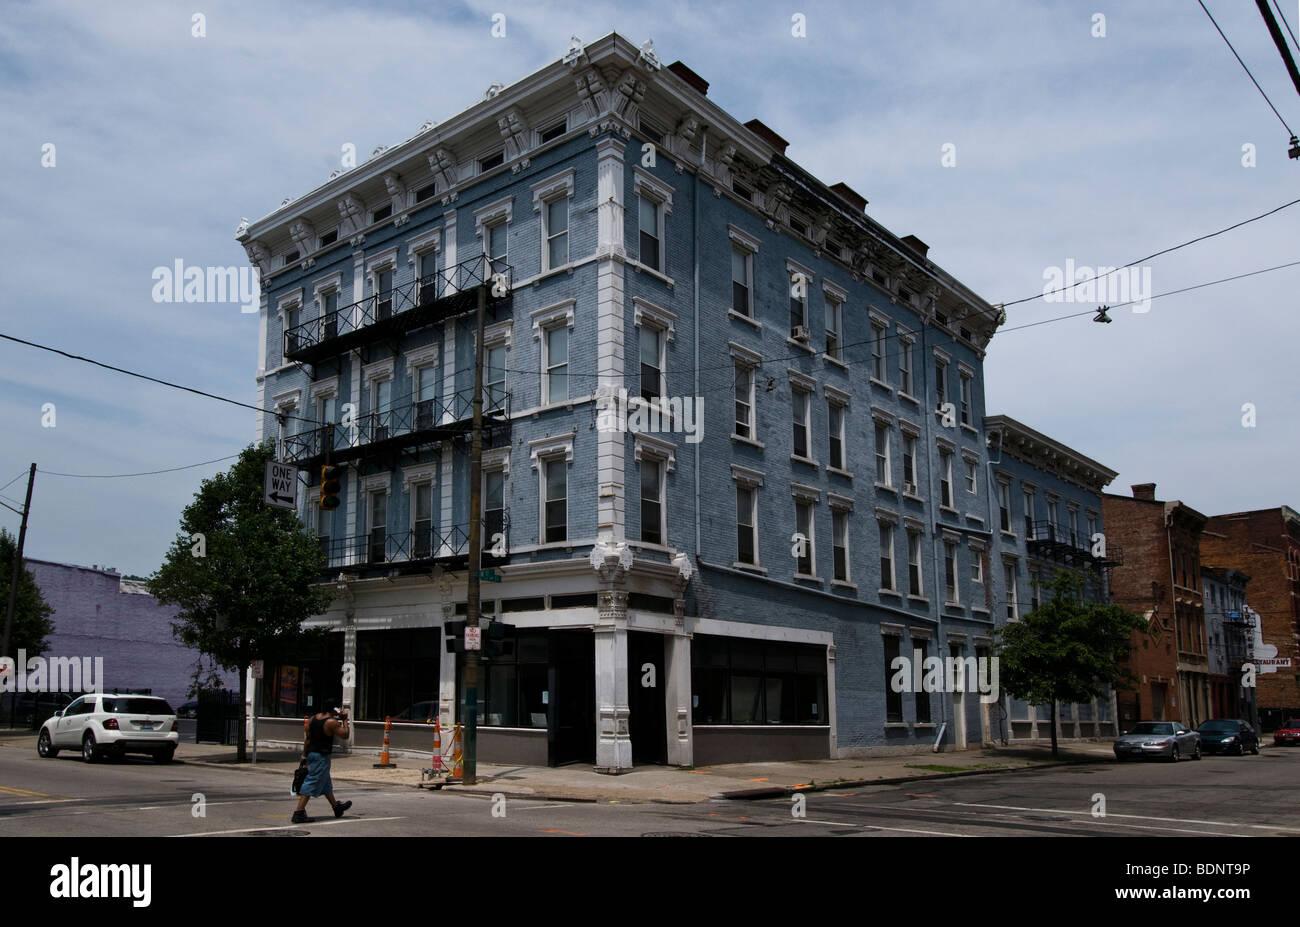 Renovated building in Cincinnati, Ohio, Over the Rhine area - Stock Image